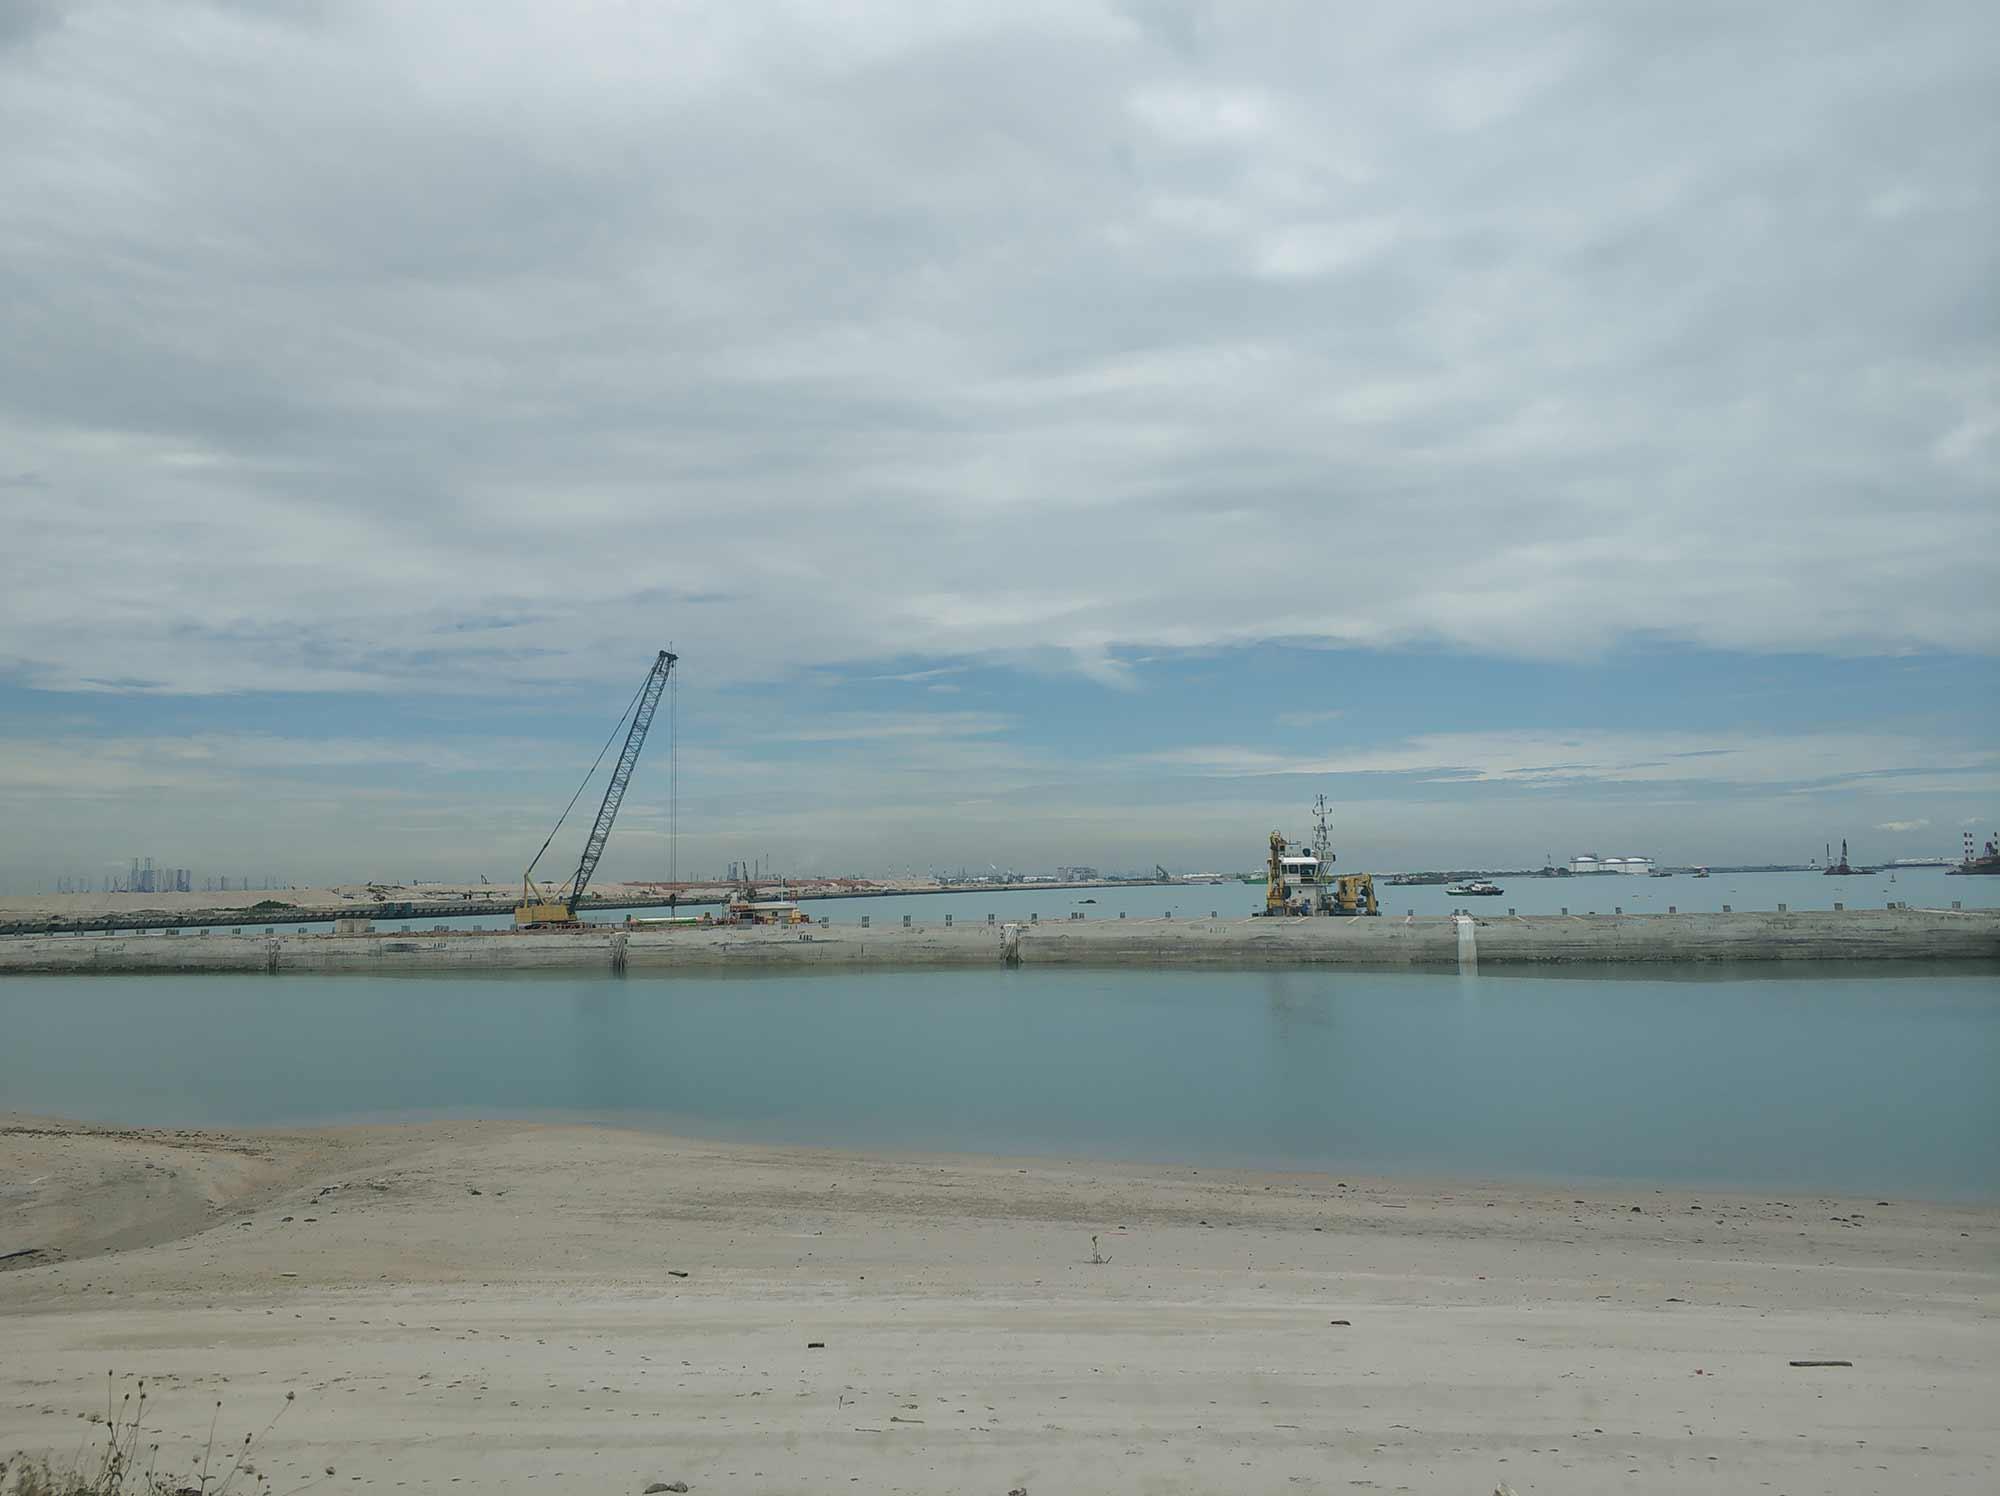 Tuas port reclamation, 2019. Photograph: William Jamieson.